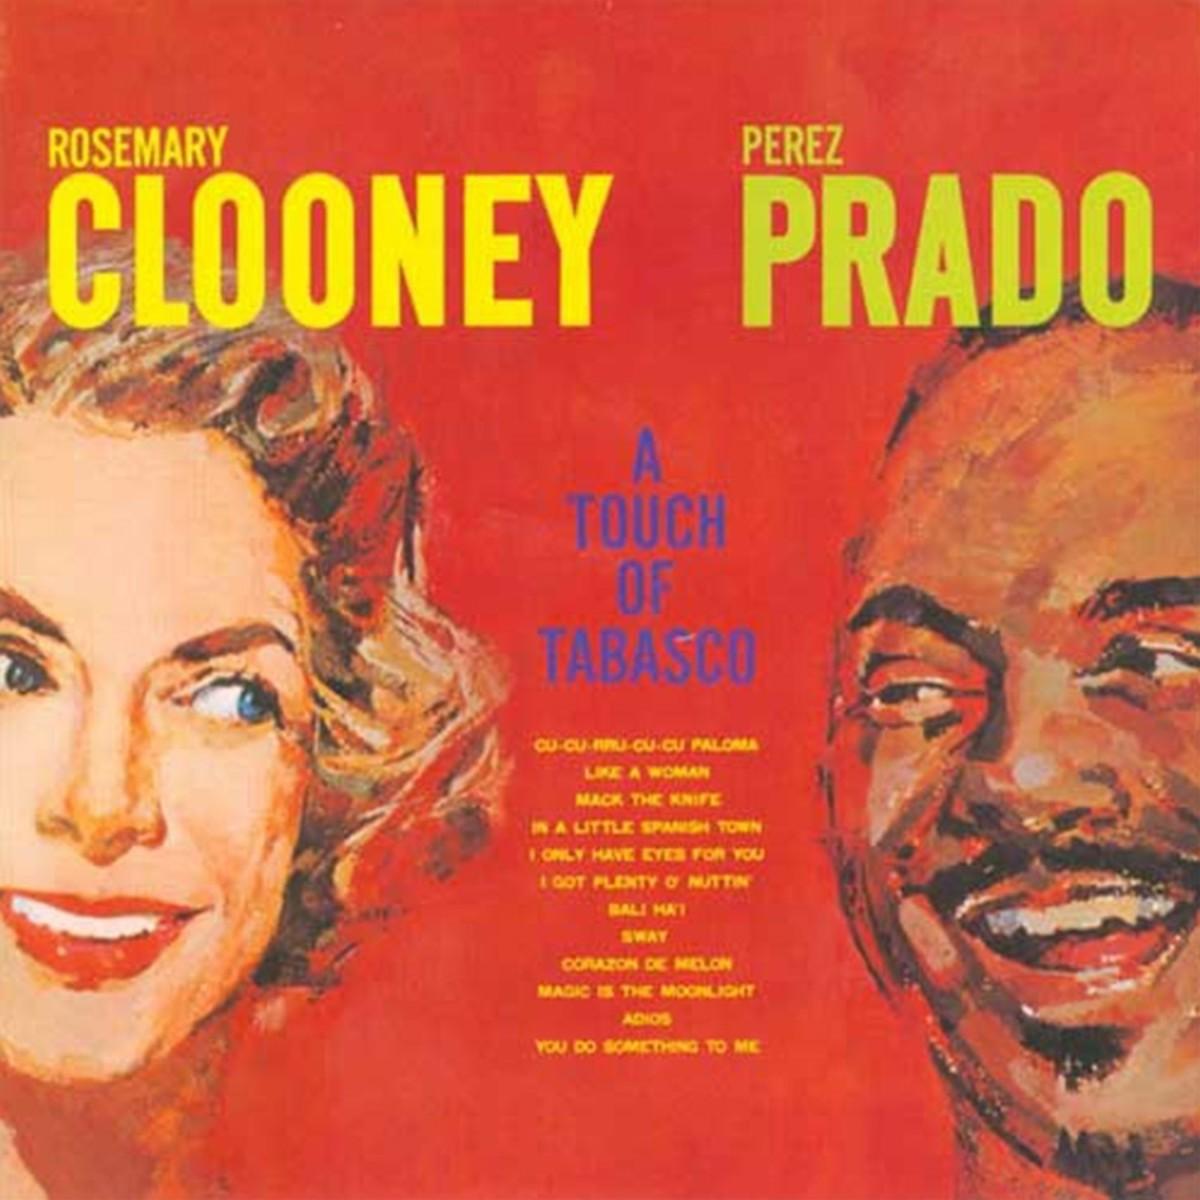 'A touch of Tabasco' album 1959 - Rosemary Clooney/ Perez Prado